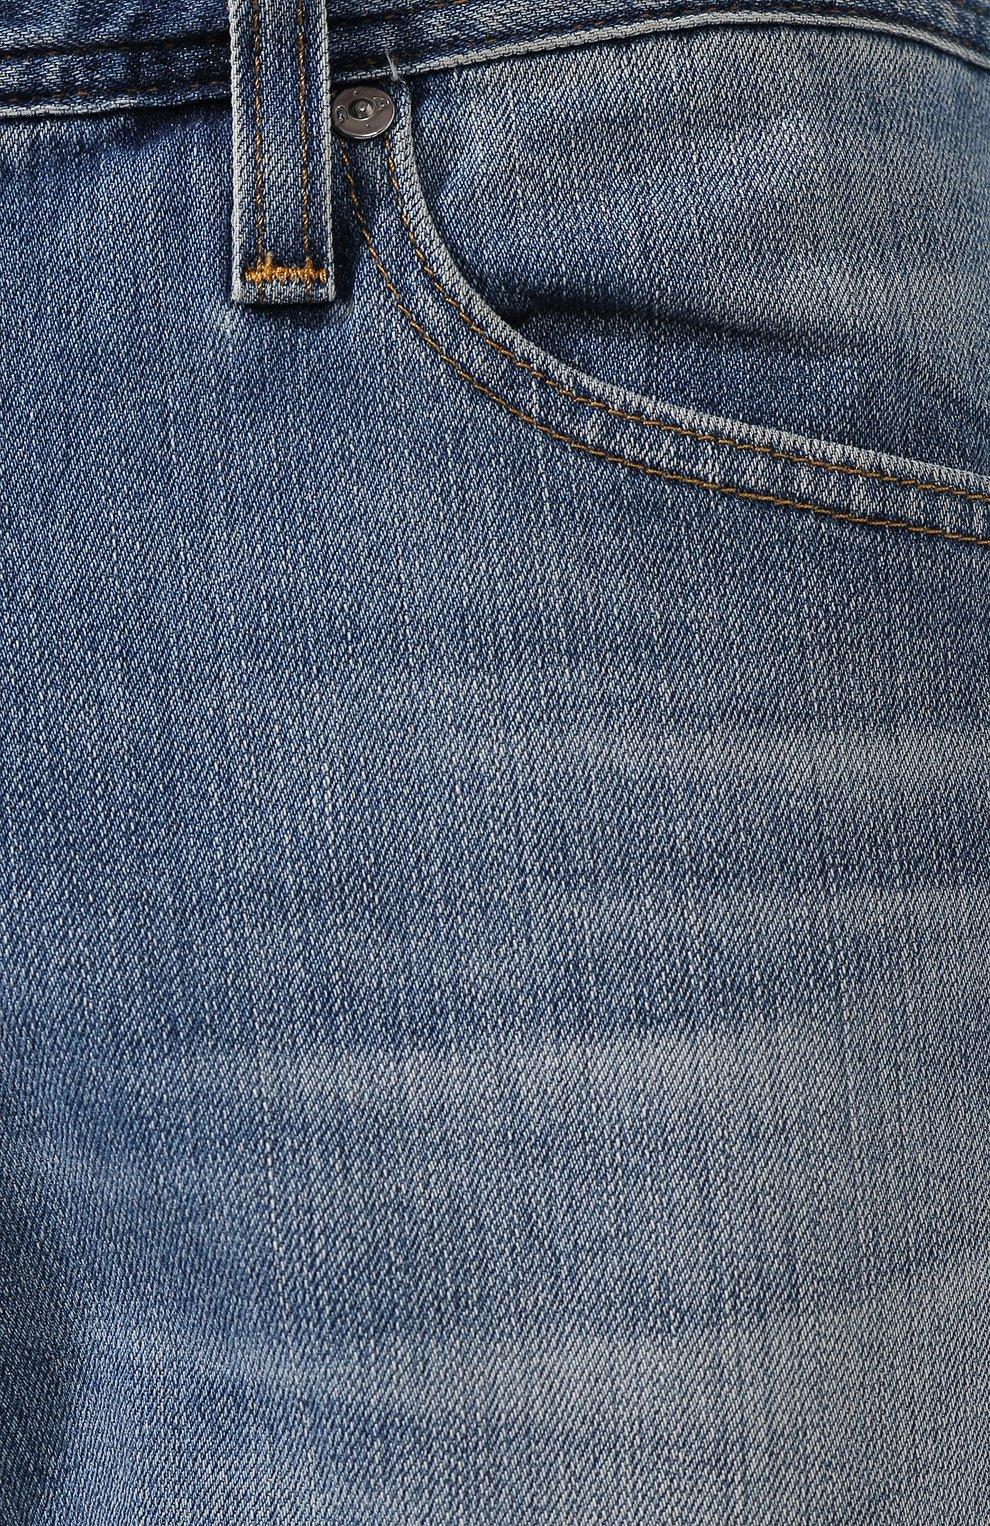 Мужские джинсы AG синего цвета, арт. 1174LED/RGSR | Фото 5